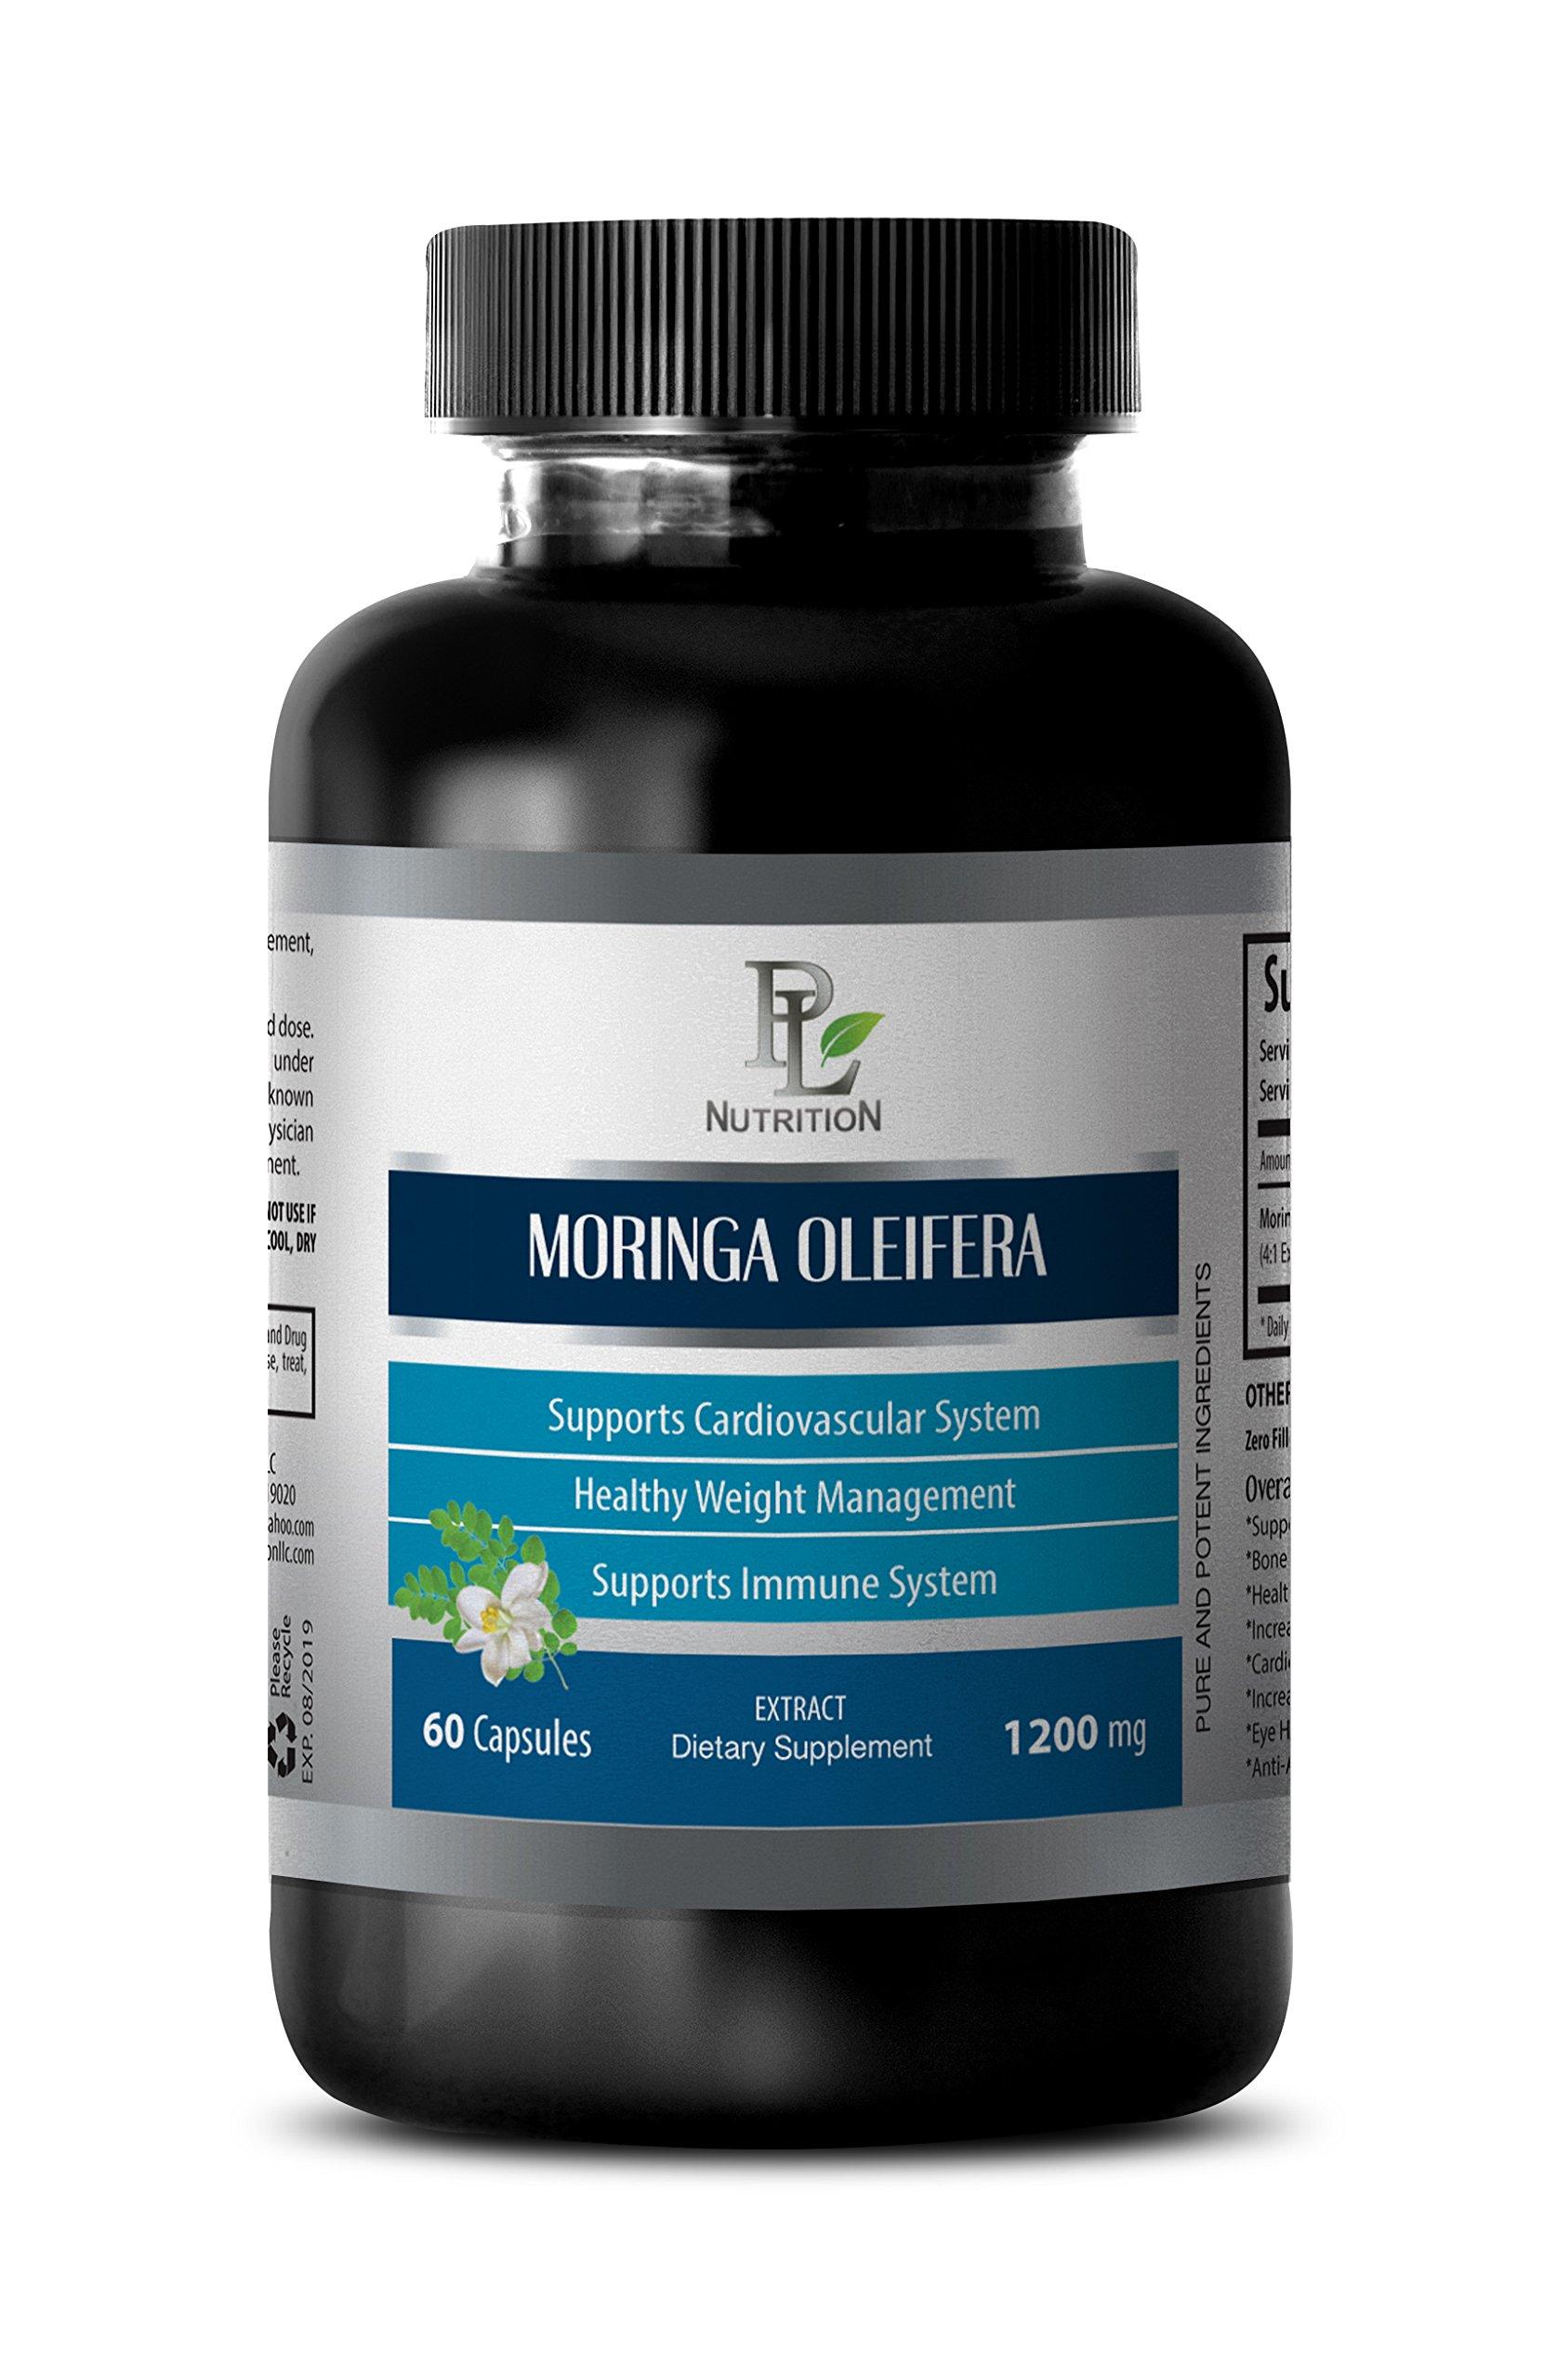 Weight loss pills - MORINGA OLEIFERA EXTRACT 1200 MG - Moringa powder - 1 Bottle 60 Capsules